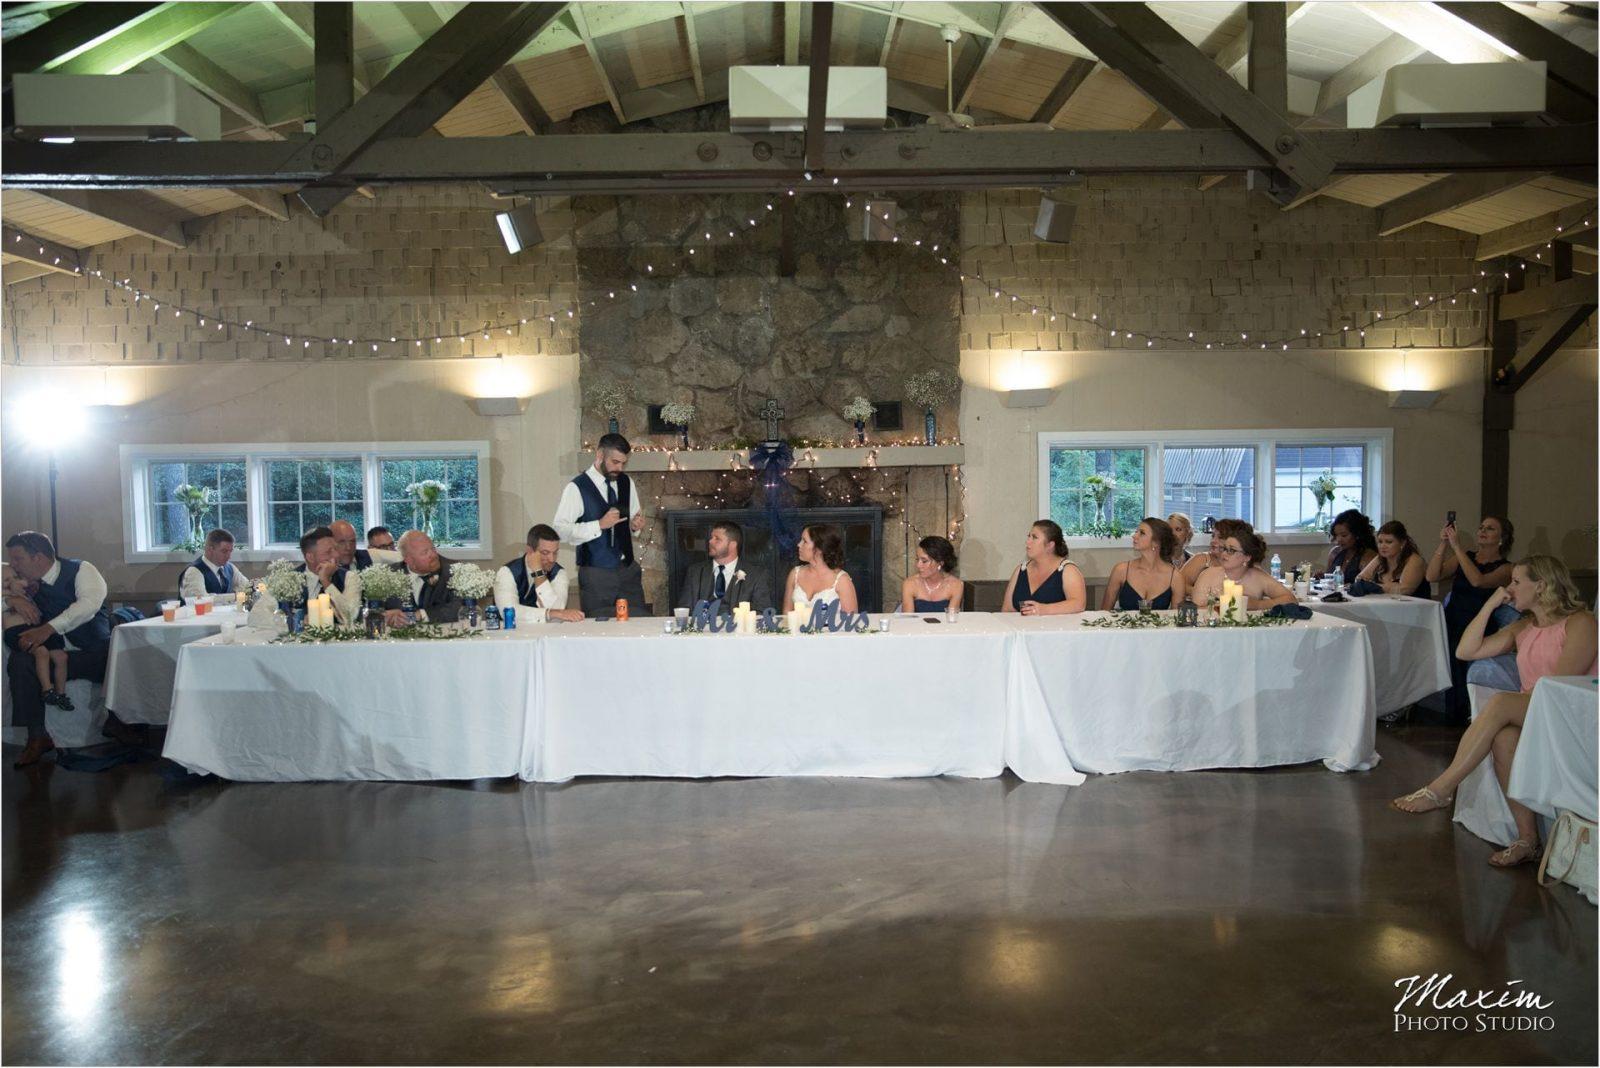 Pattison Park Lodge Wedding Reception